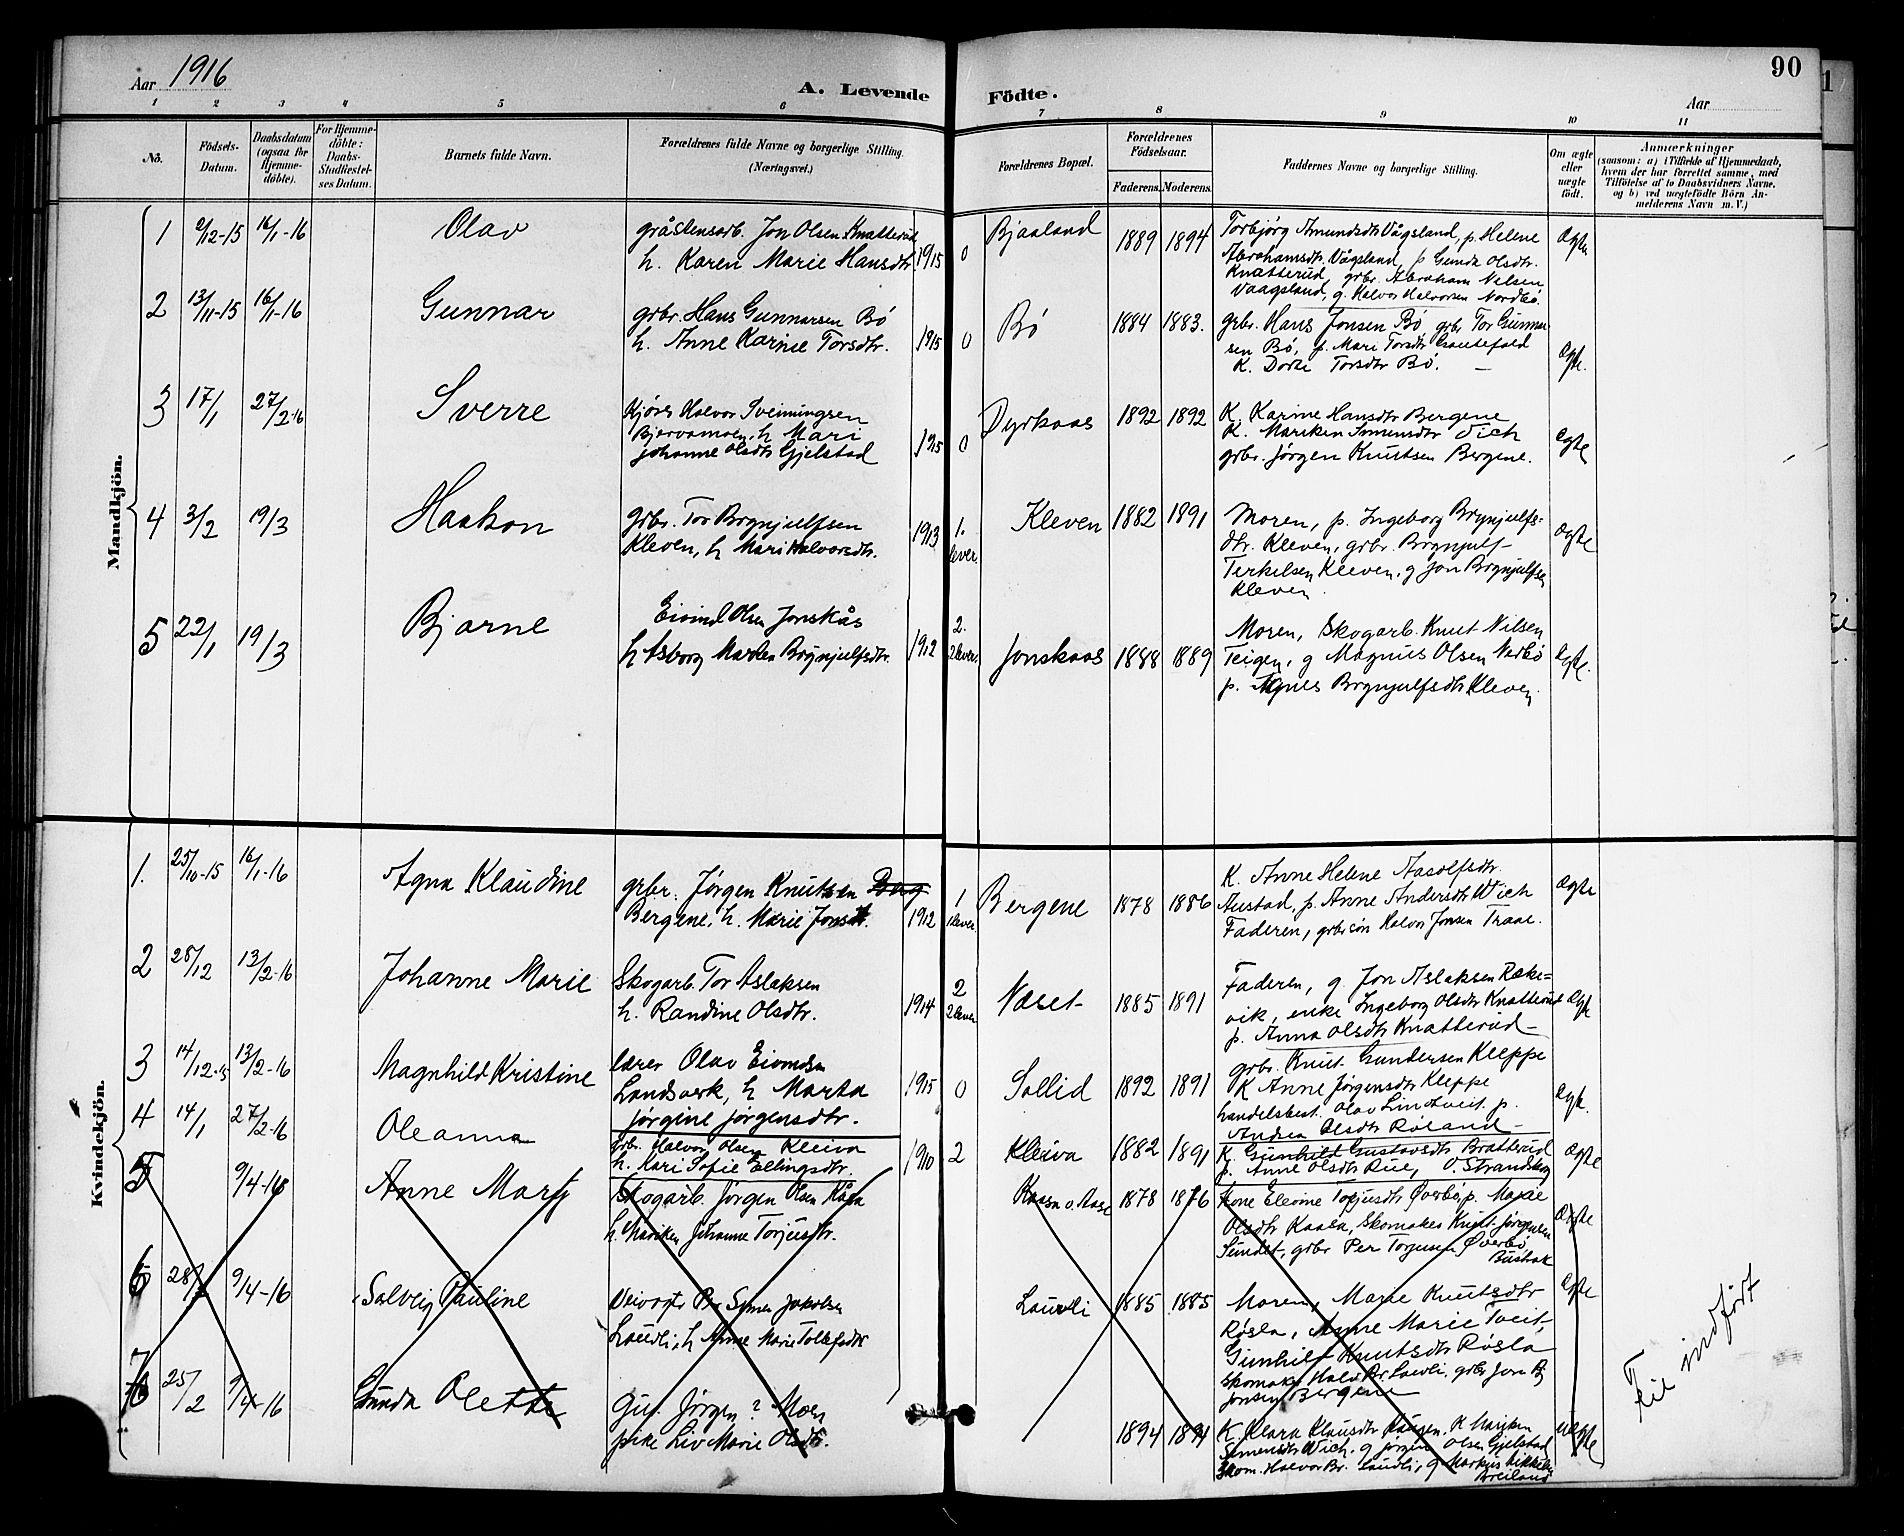 SAKO, Drangedal kirkebøker, G/Gb/L0002: Klokkerbok nr. II 2, 1895-1918, s. 90